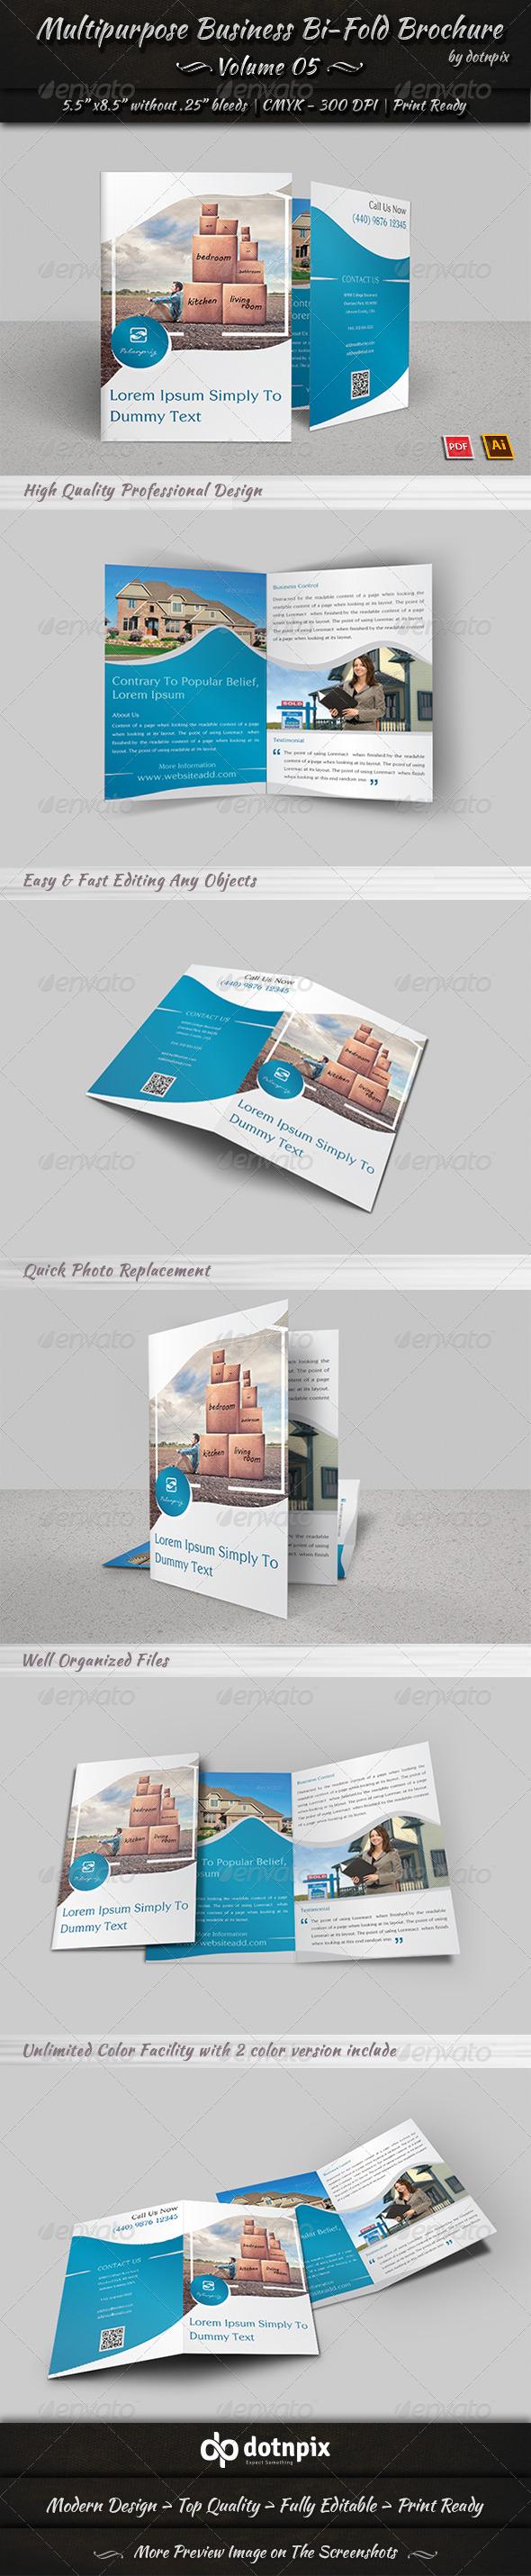 GraphicRiver Multipurpose Business Bi-Fold Brochure Volume 5 8032692